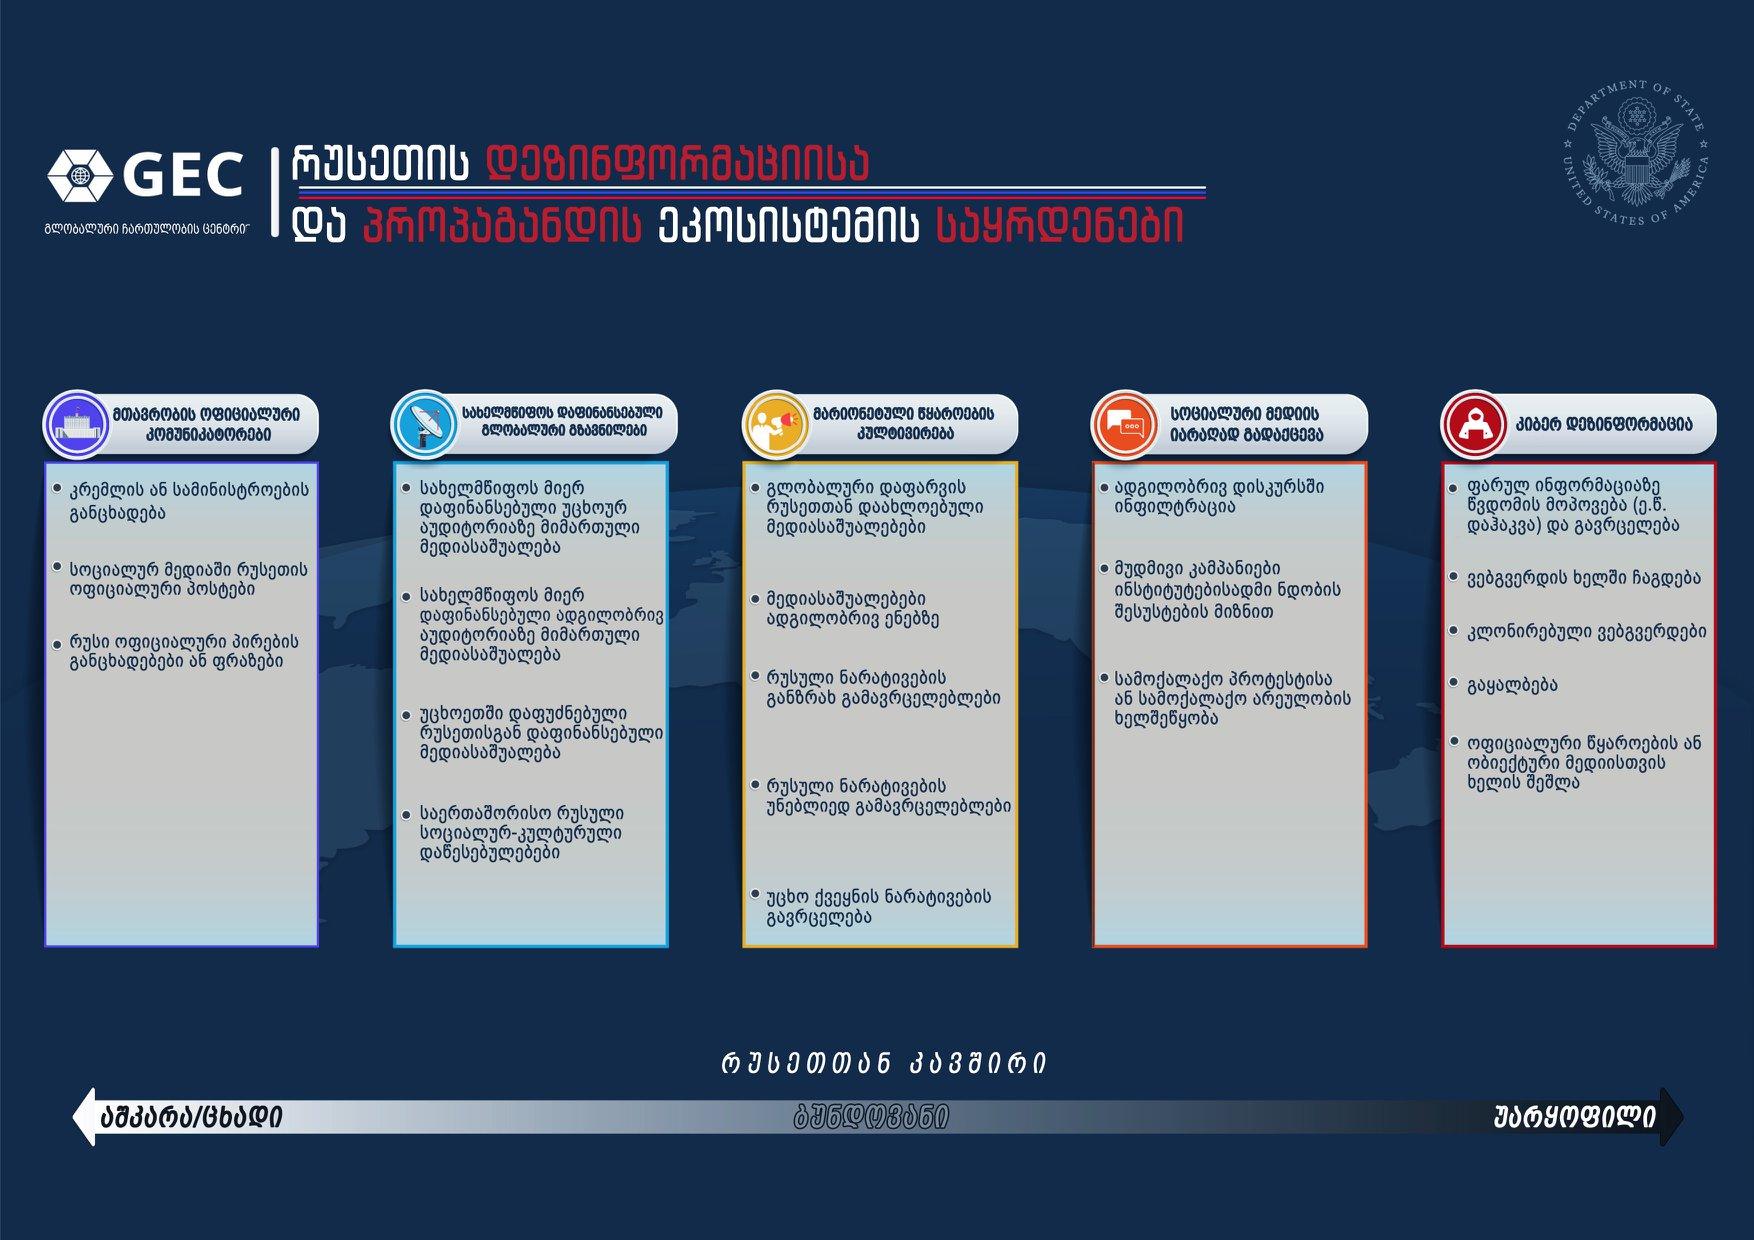 Pillars of Russia's Disinformation and Propaganda Ecosystem